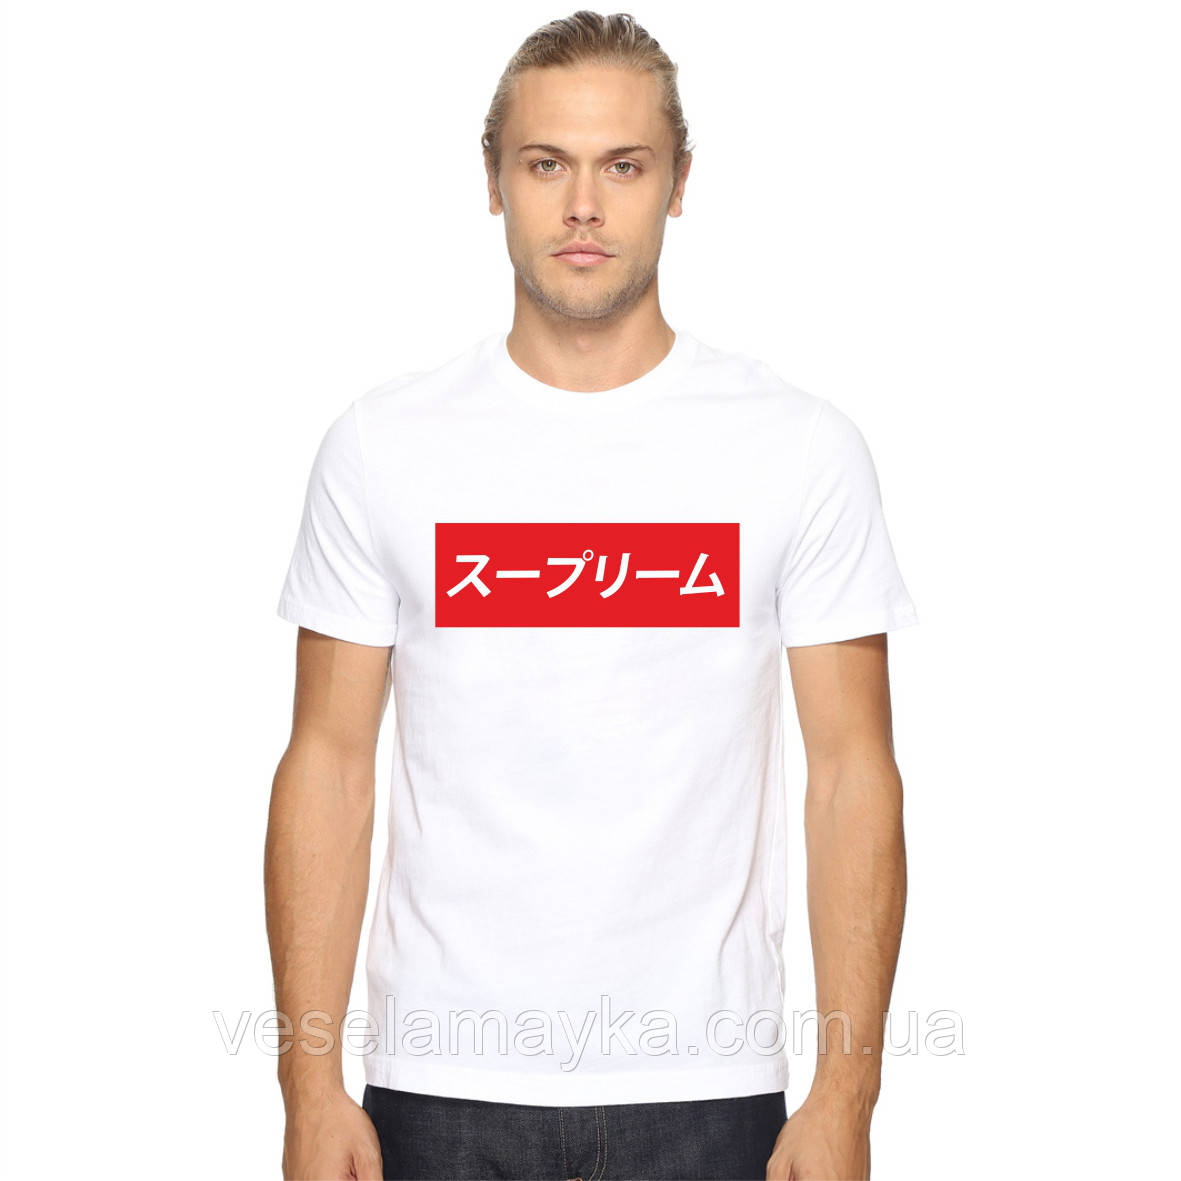 Футболка Supreme (Japan)